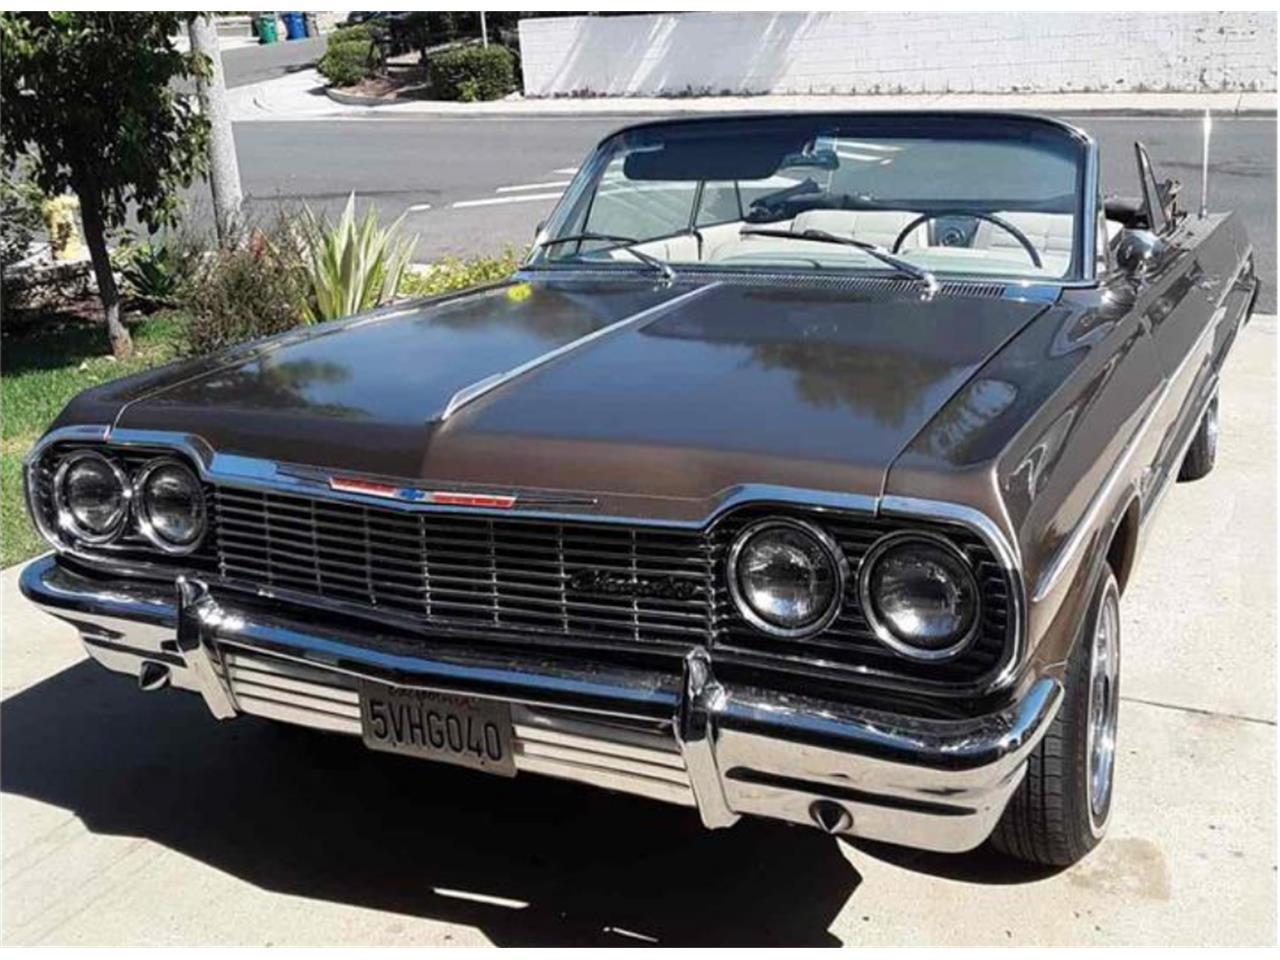 1964 Chevrolet Impala (CC-1266545) for sale in San Diego, California